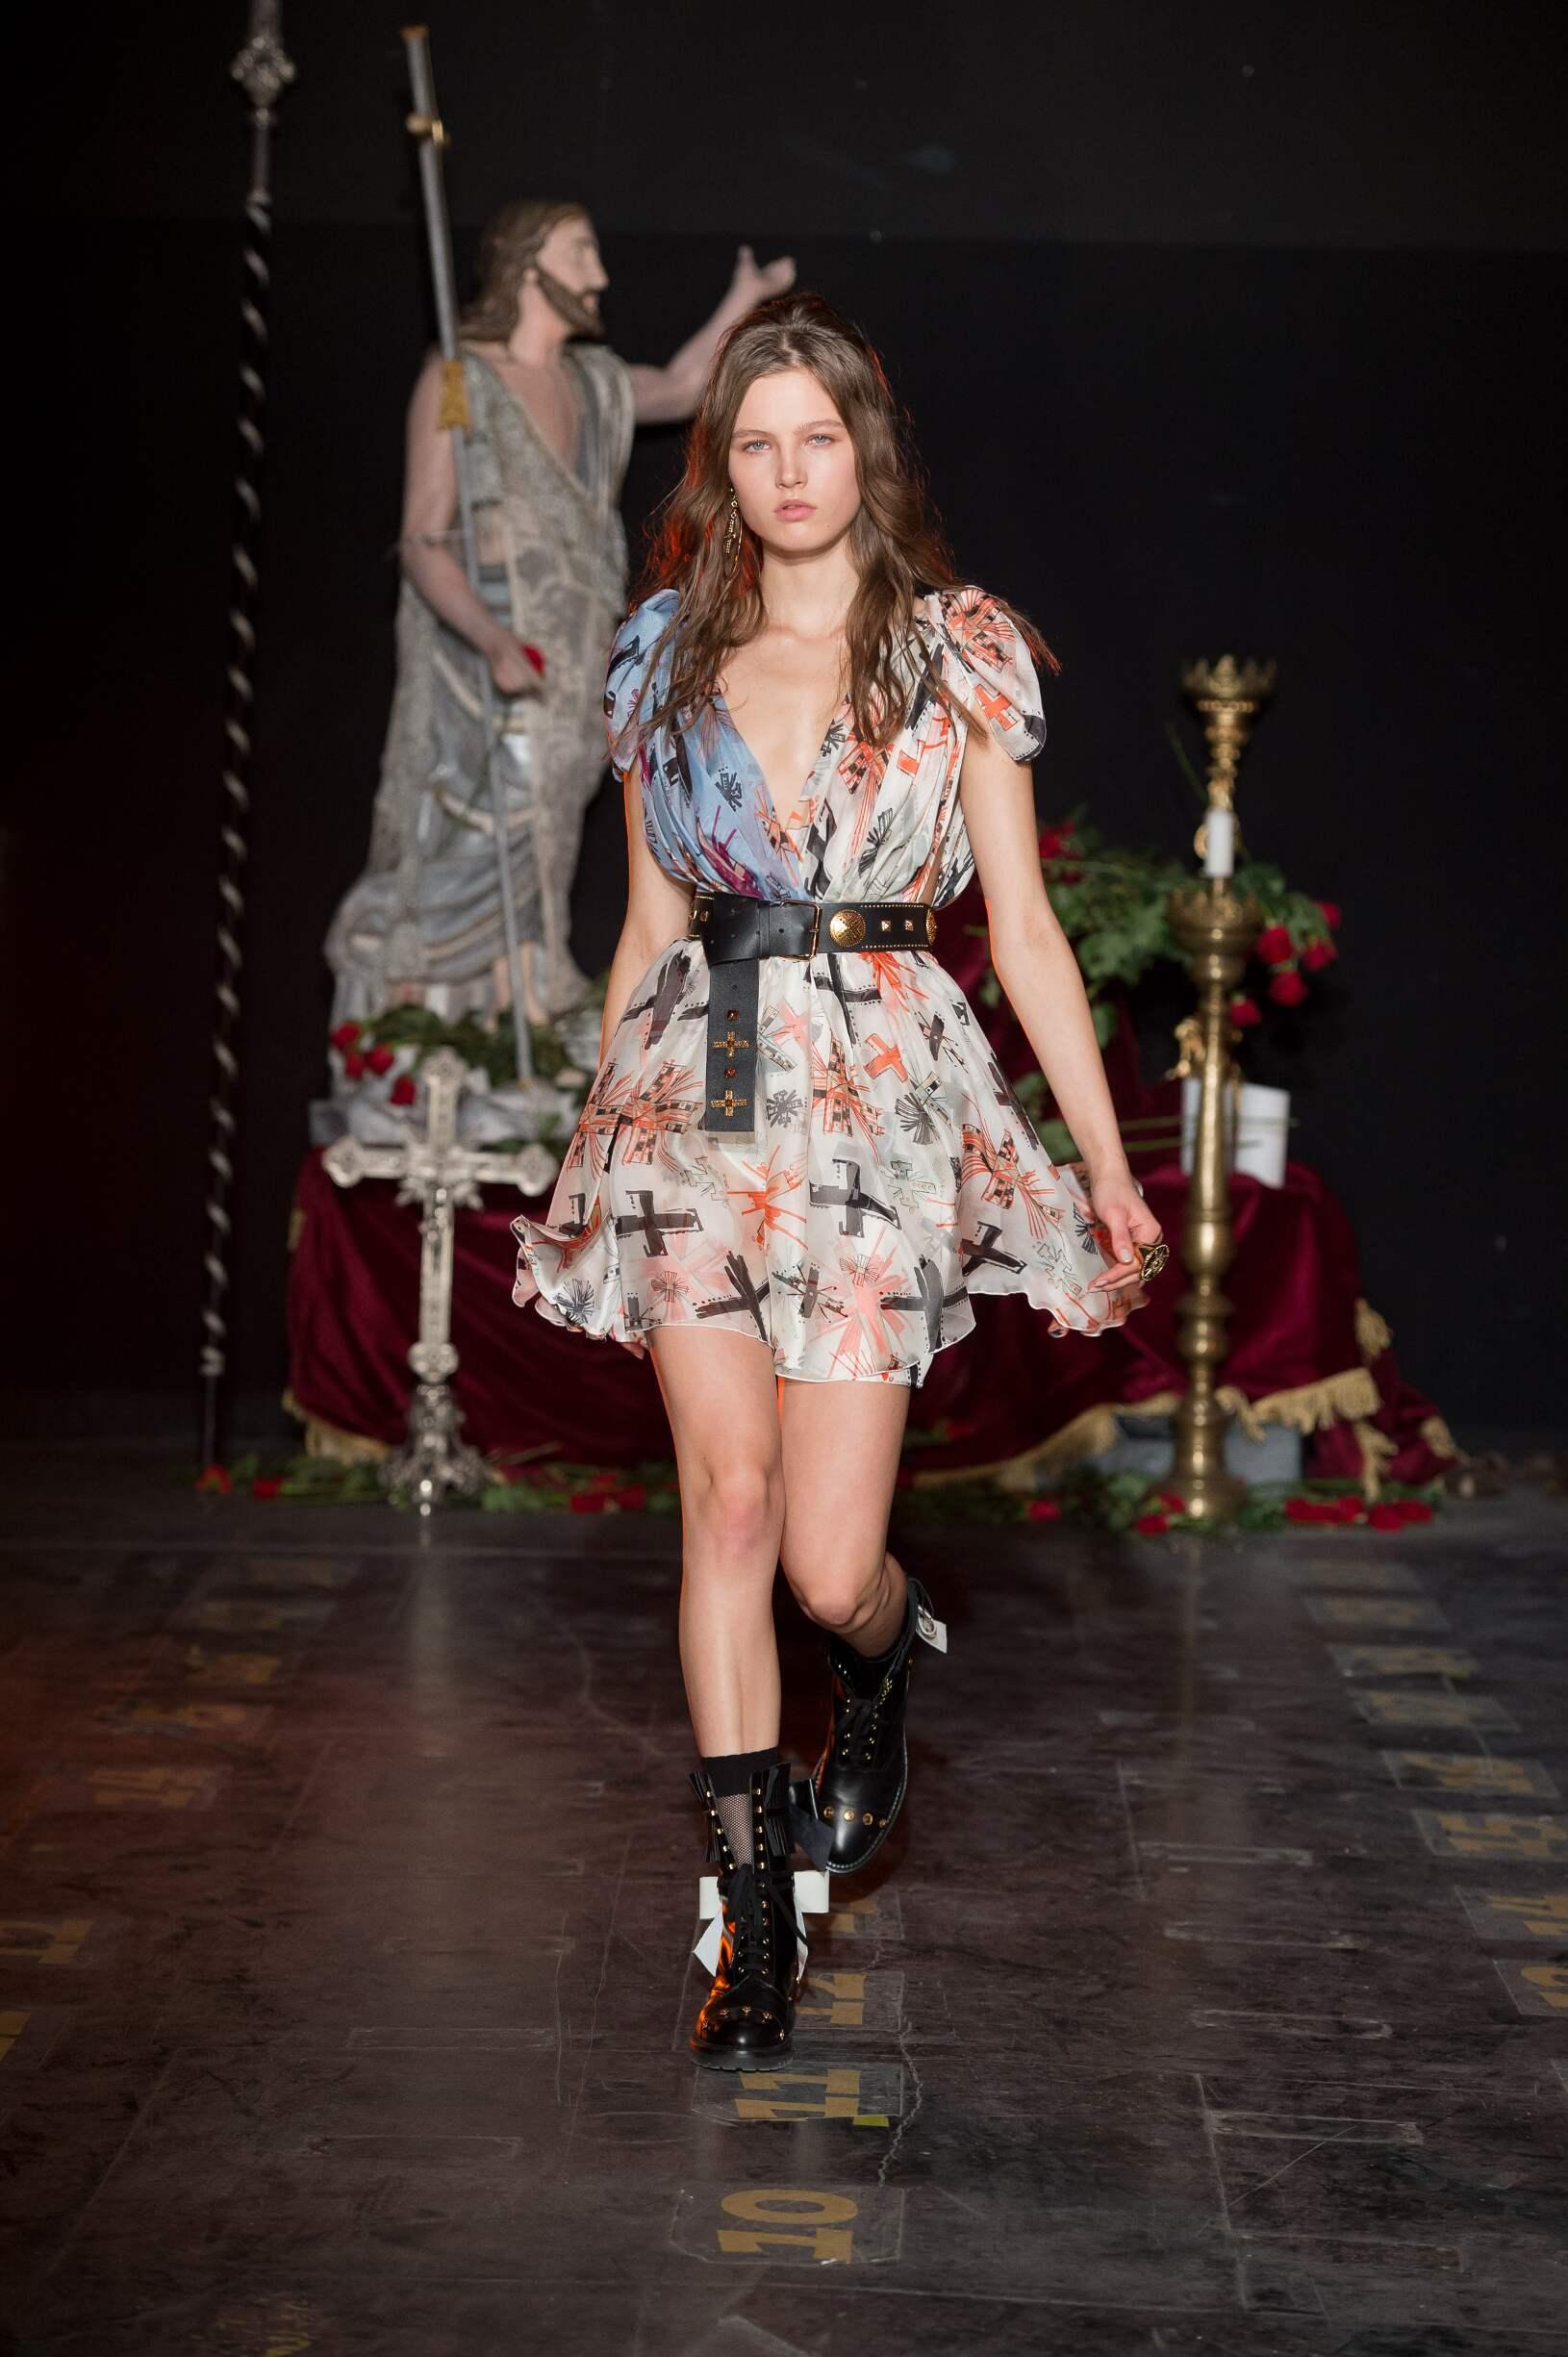 2017 Catwalk Fausto Puglisi Woman Fashion Show Summer